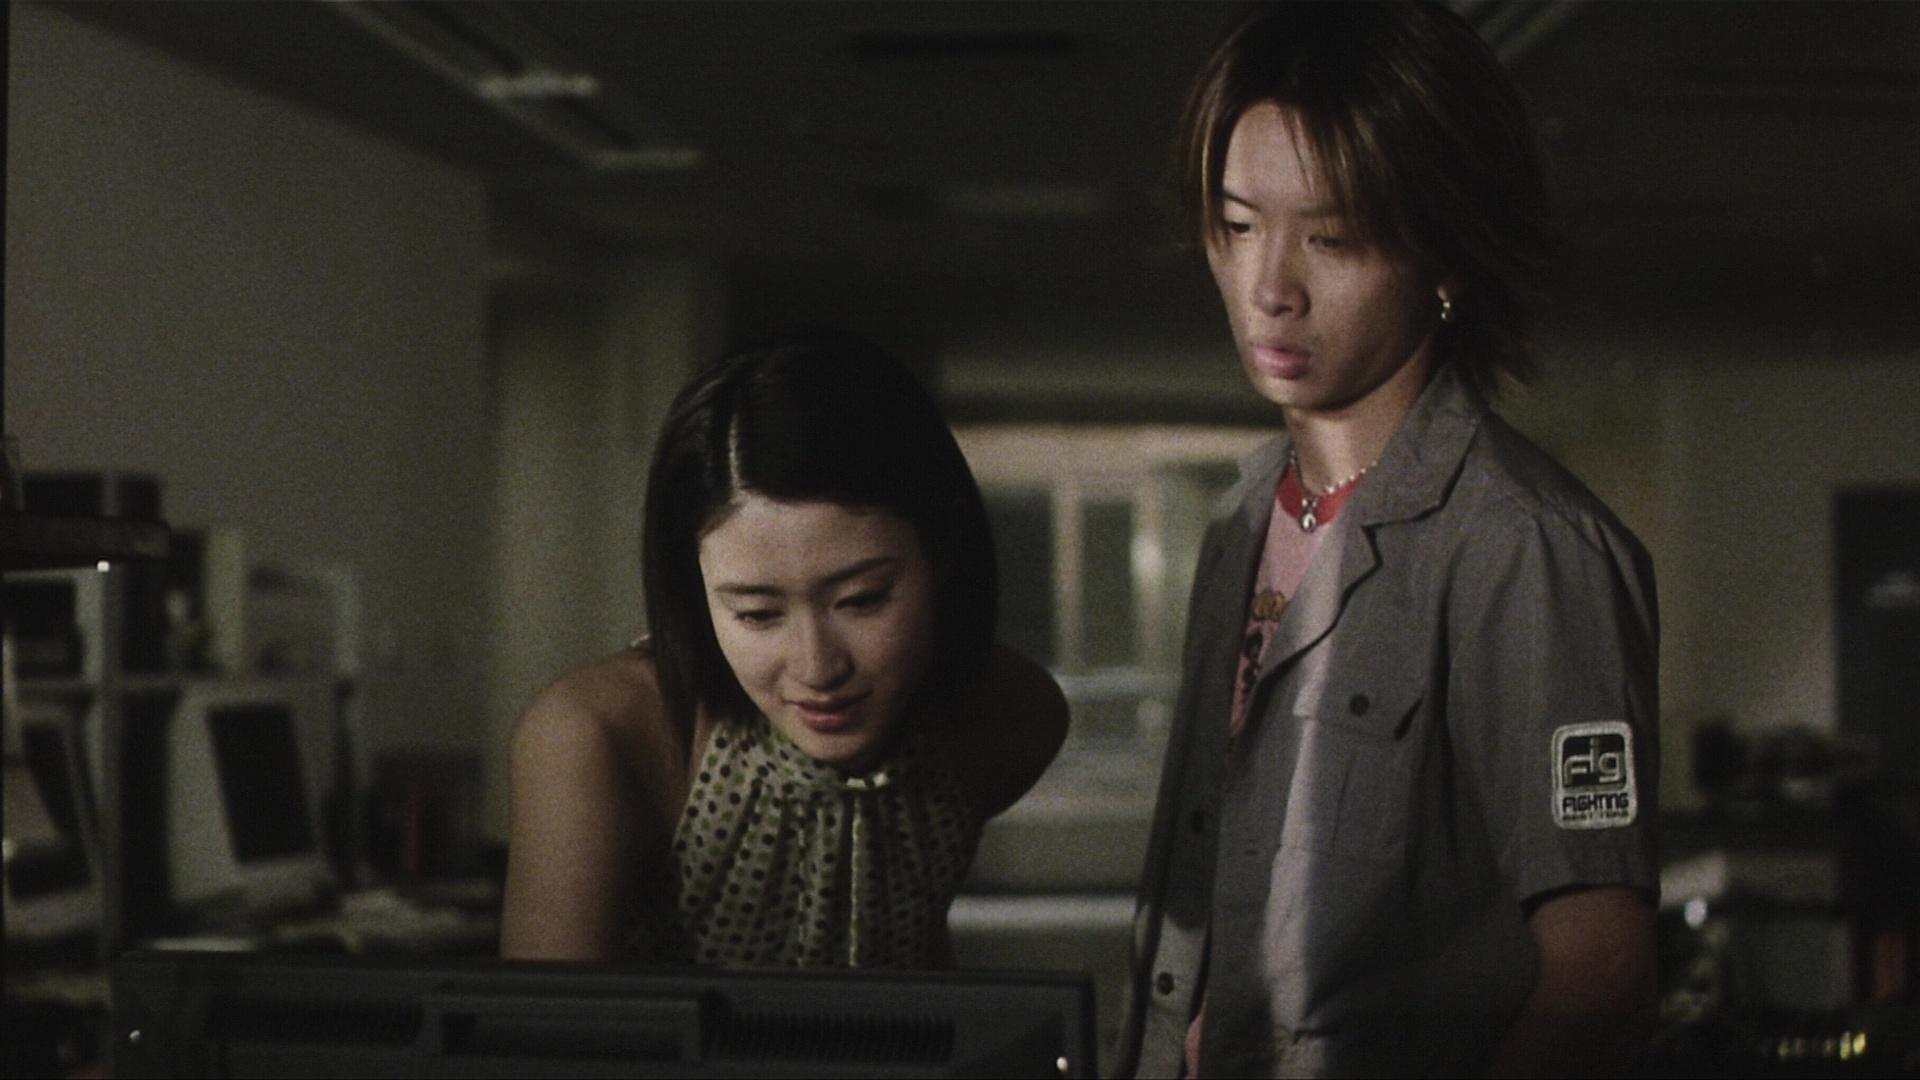 Cure kiyoshi kurosawa online dating 8